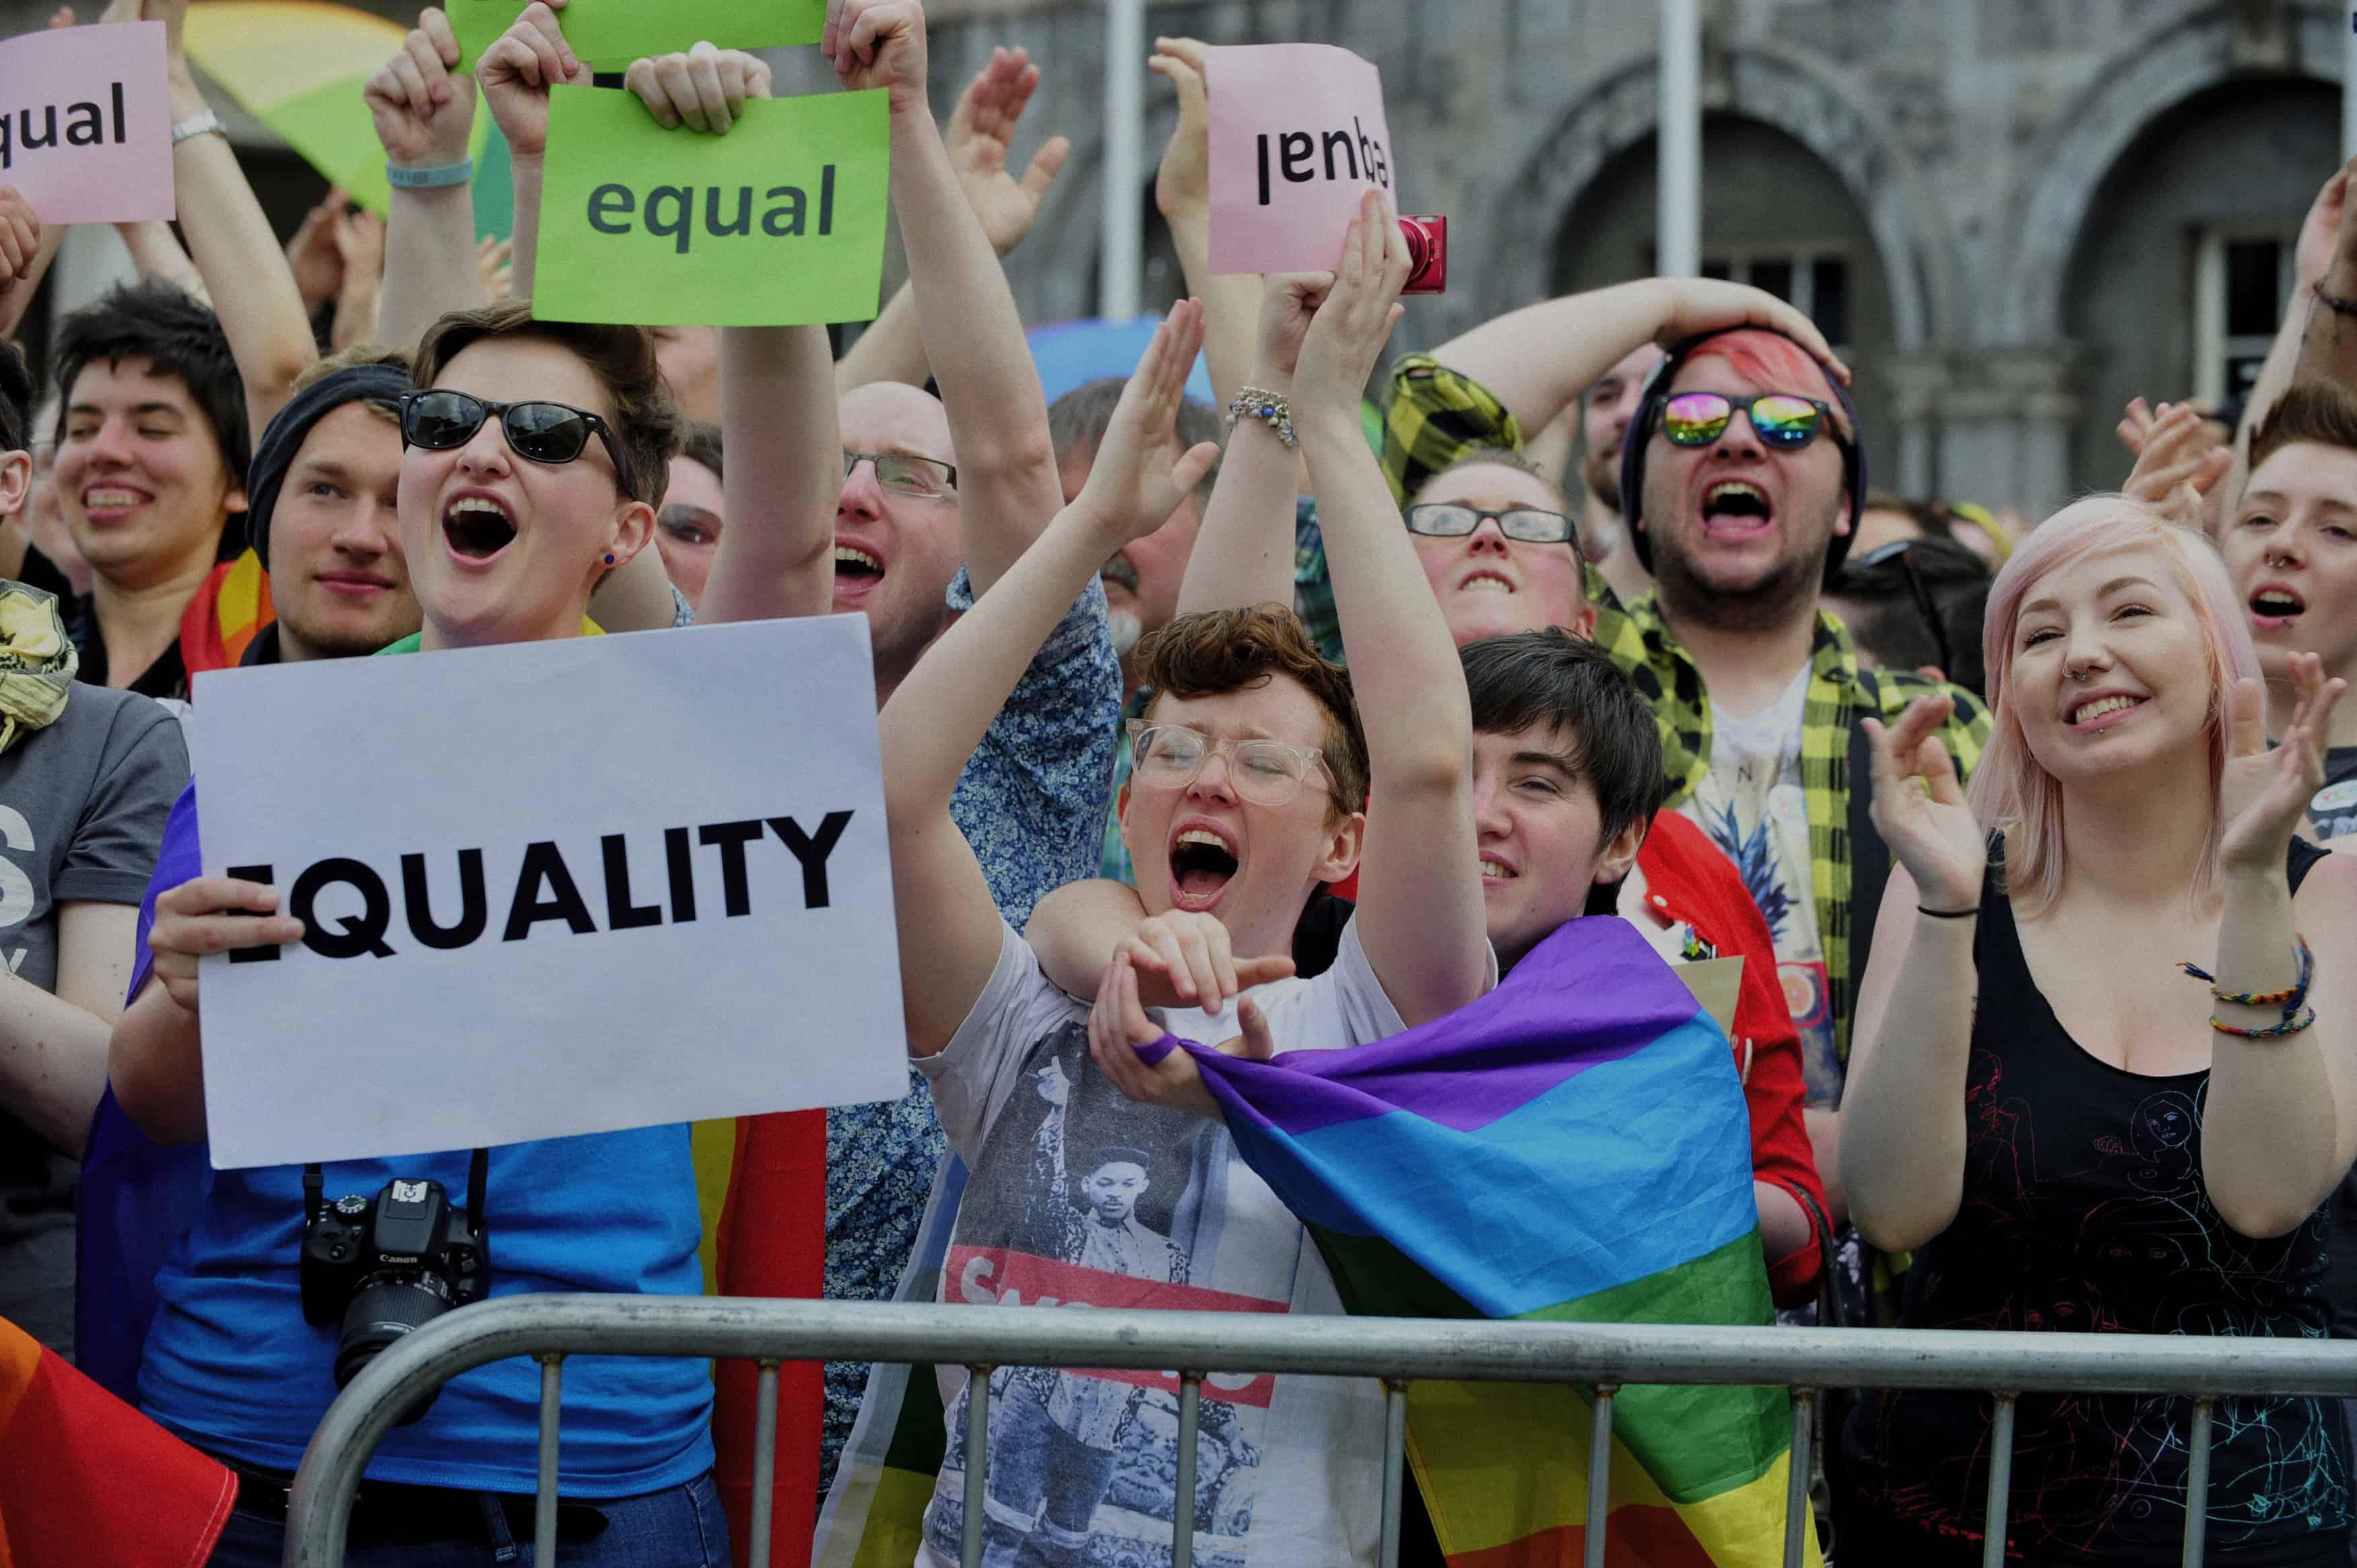 Foto: Esultanza vittoria referendum matrimonio omosex in Irlanda/ Foto: Aidan Crawley, EPA